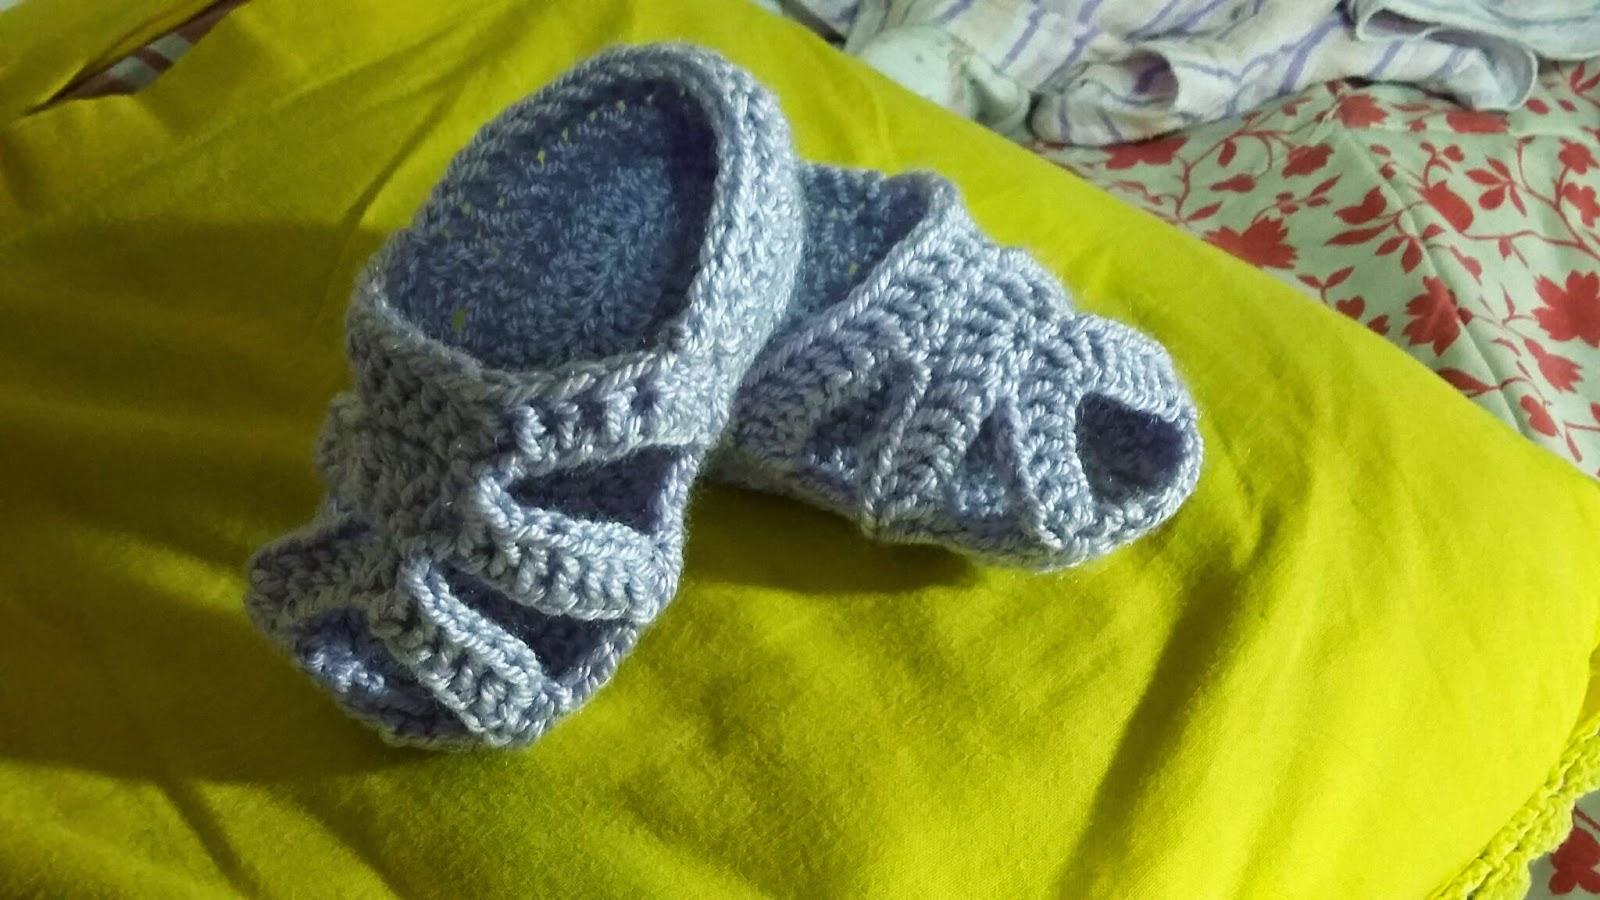 Majetejidos chalitas a crochet para beb 2500 chalitas a crochet para beb 2500 thecheapjerseys Choice Image